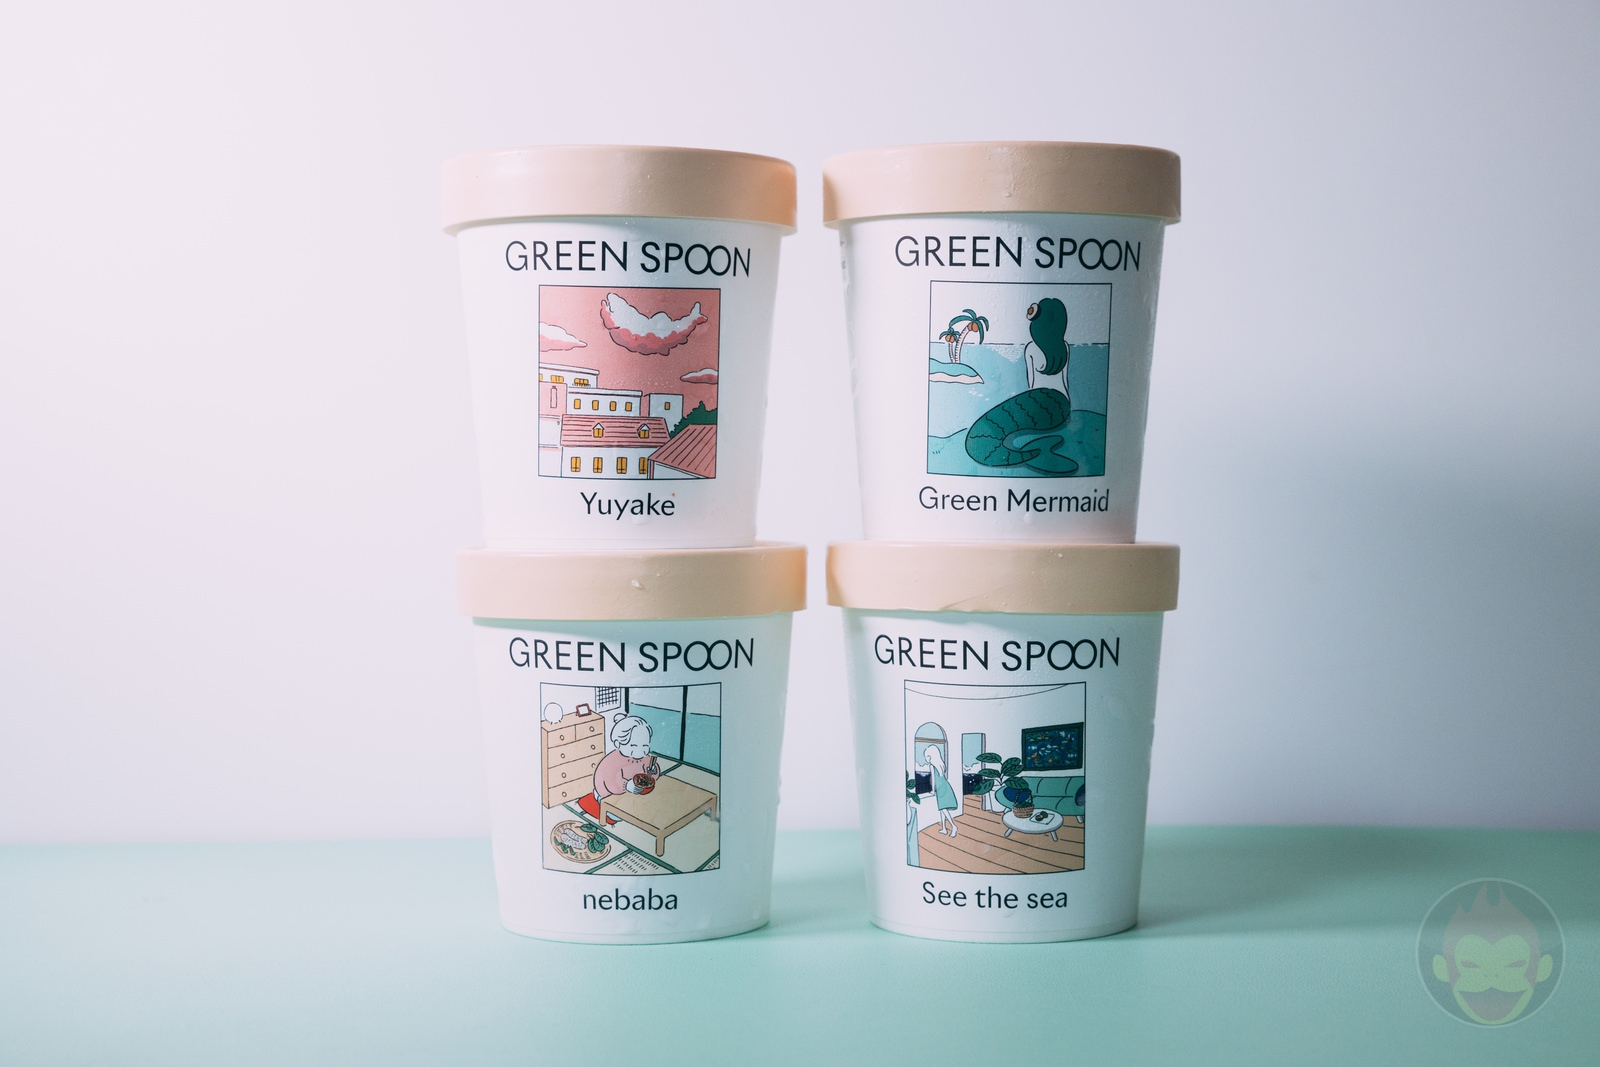 Green Spoon Soup wasa amazing 01